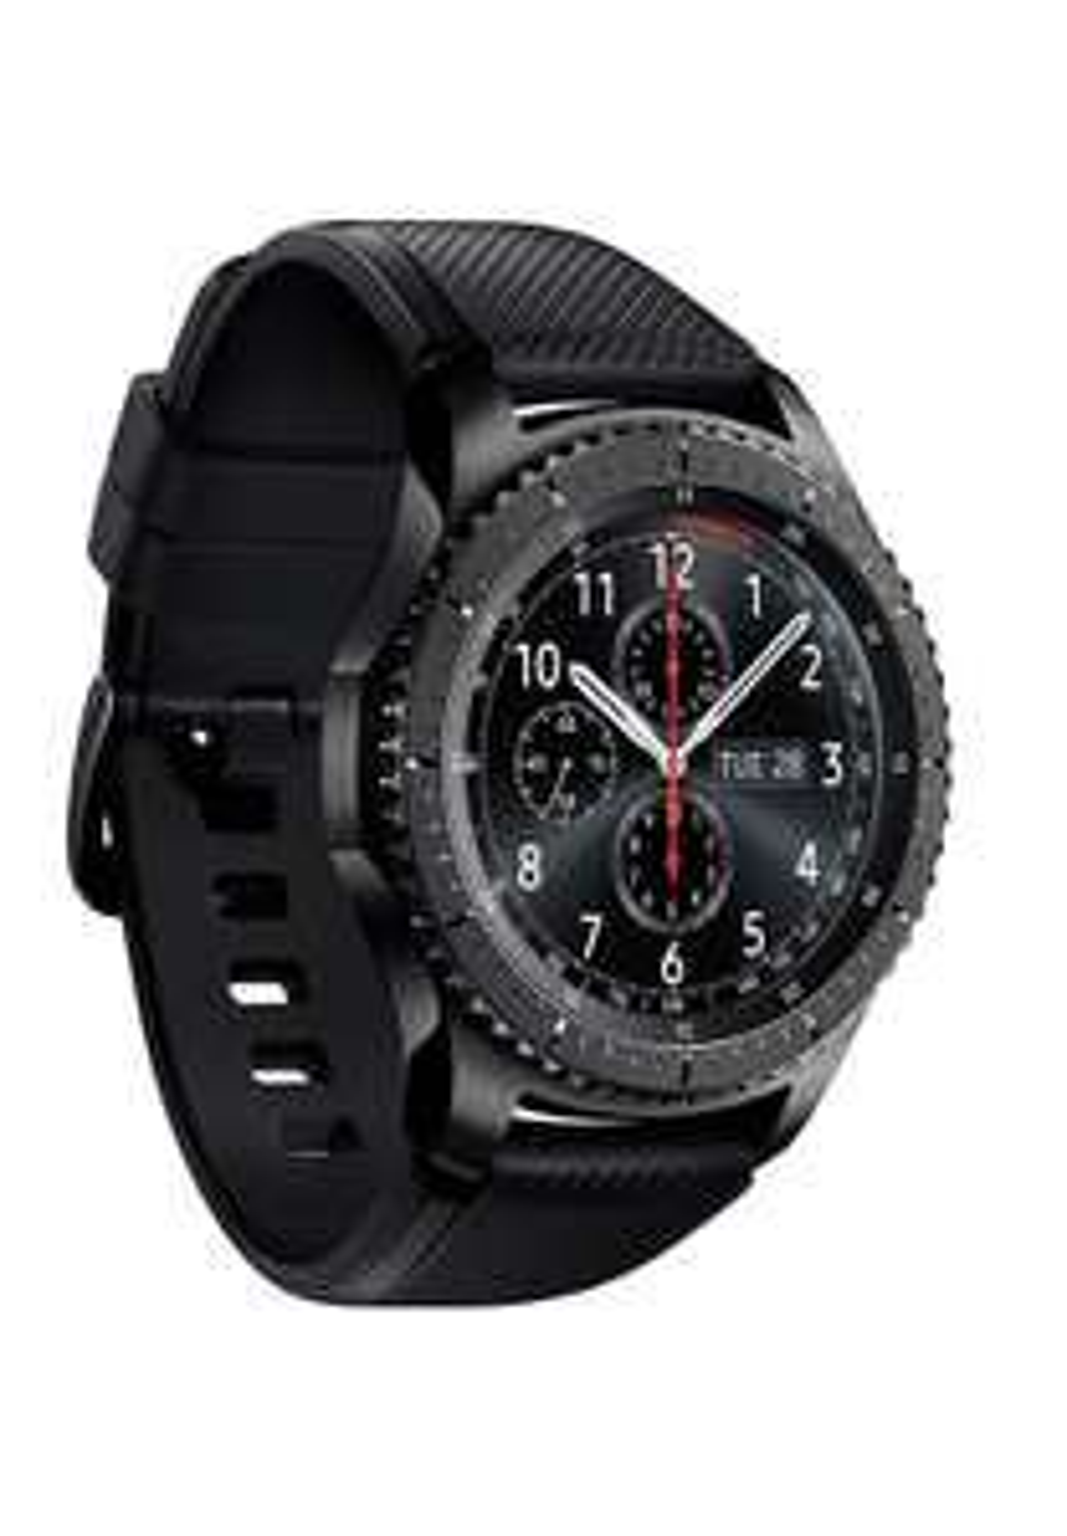 Samsung Gear S3 Frontier Smart Watch £251 @ Very